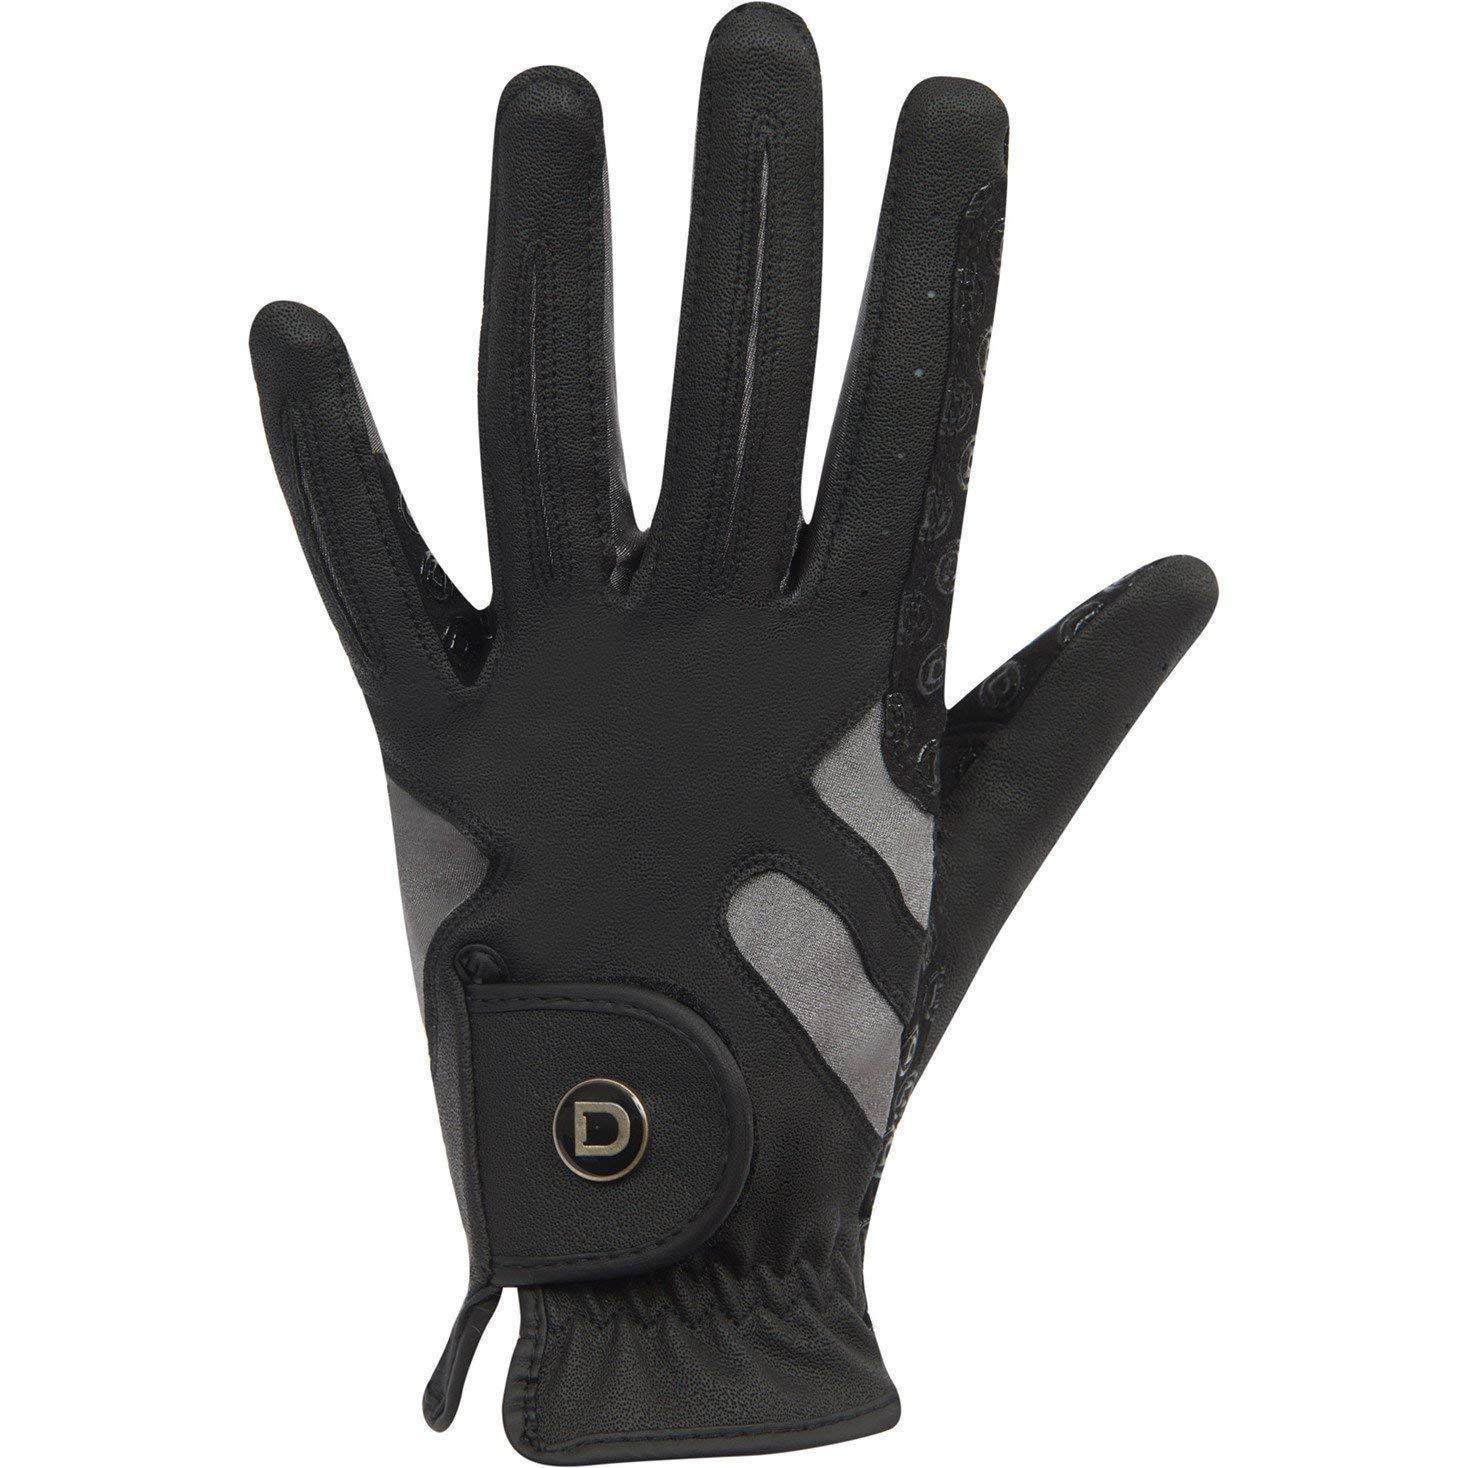 Dublin Cool-It Gel Riding Glove